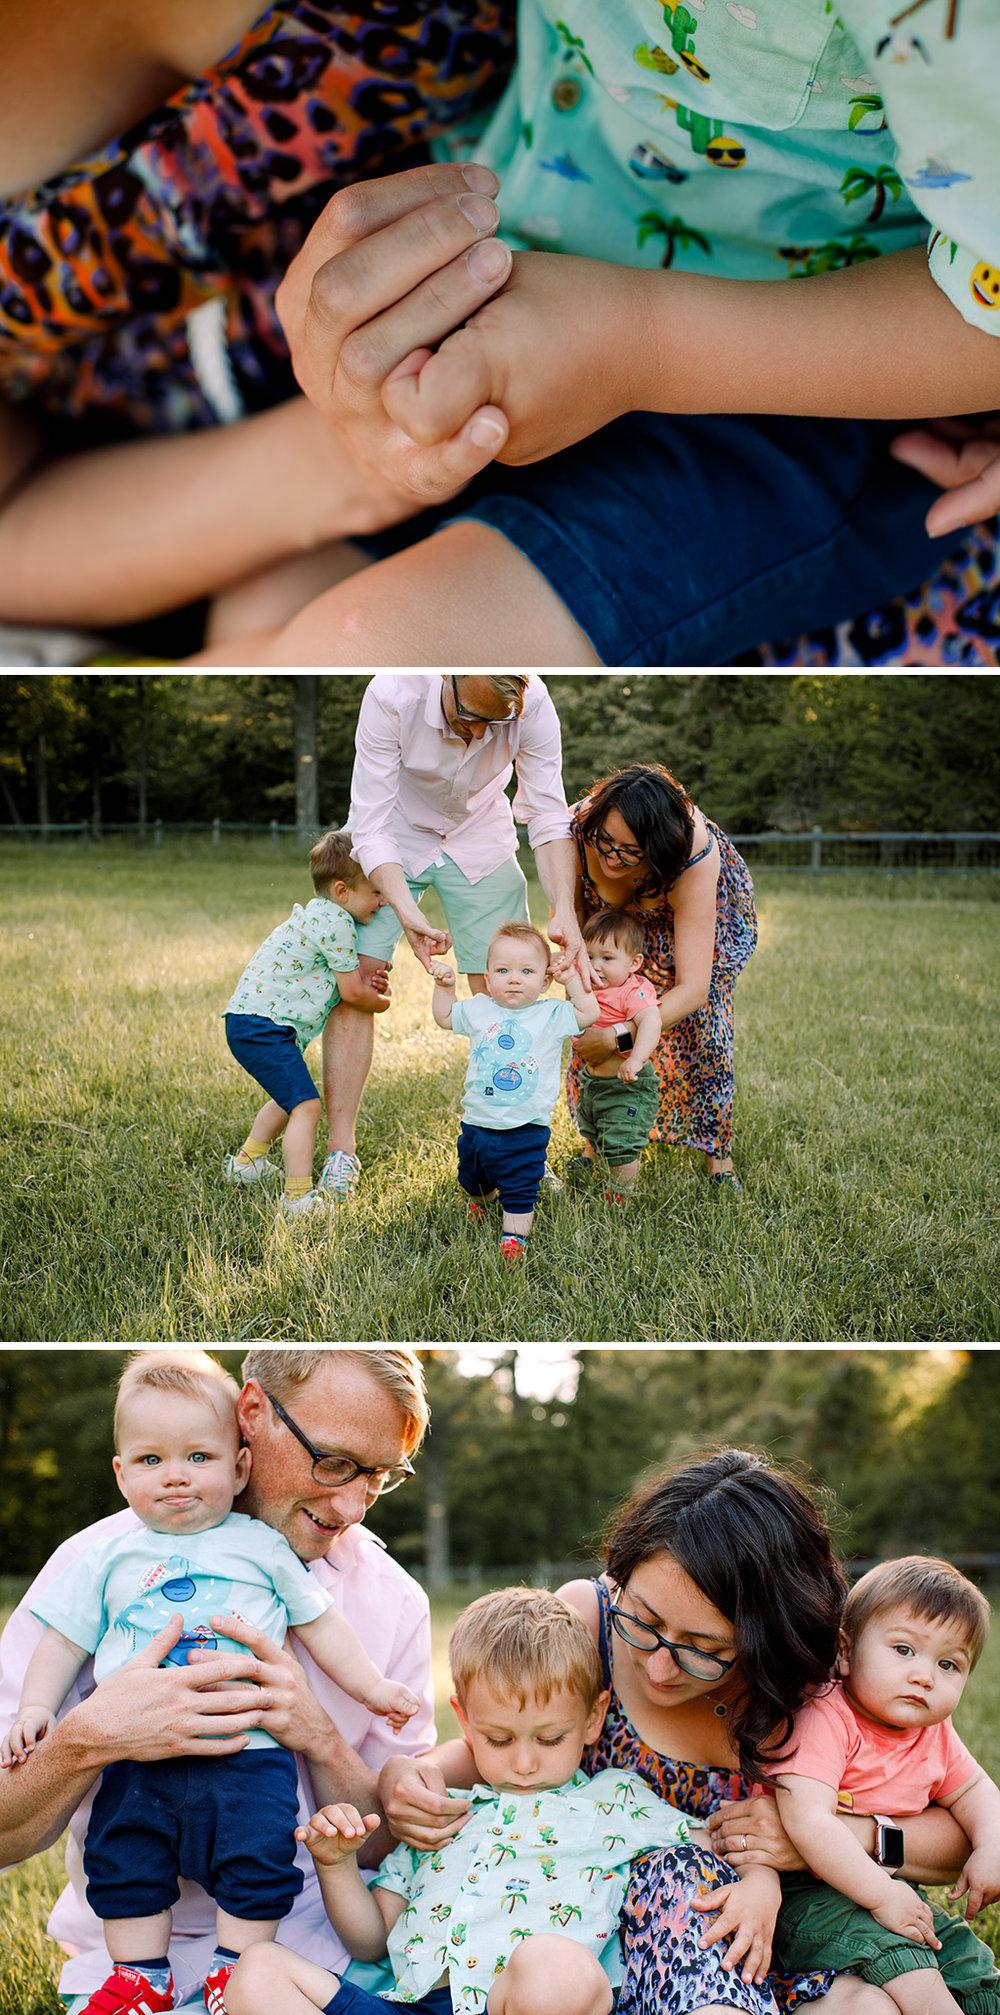 Sommar-familjefotografering_Stockholm_Anna_Sandstrom_10.jpg